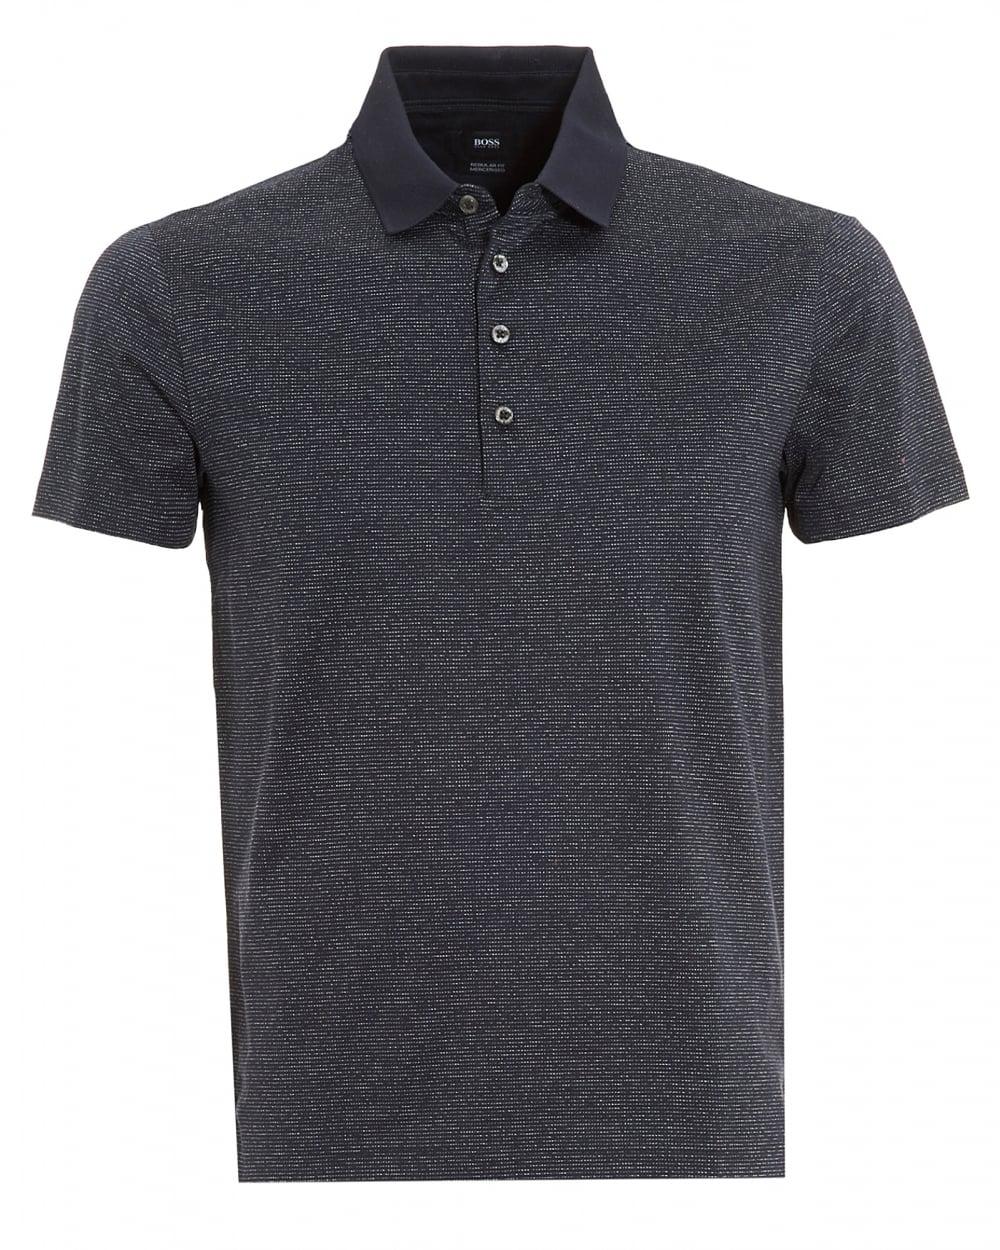 192f5780f Hugo Boss Black Mens Pitton 06 Polo, Fleck Regular Fit Navy Polo Shirt